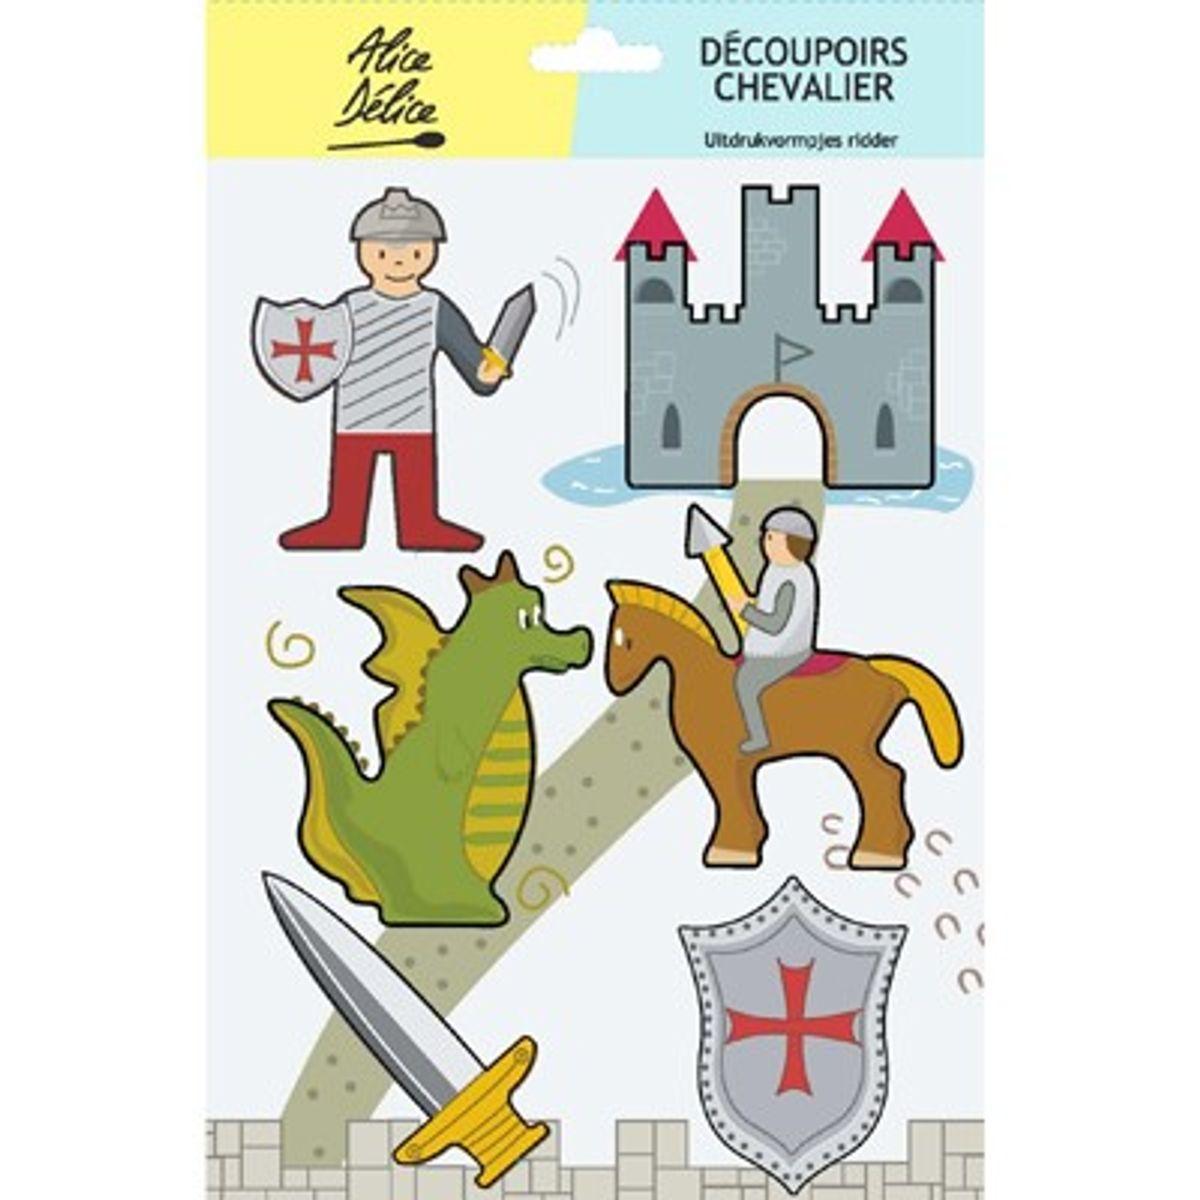 6 découpoirs inox chevalier - Alice Délice